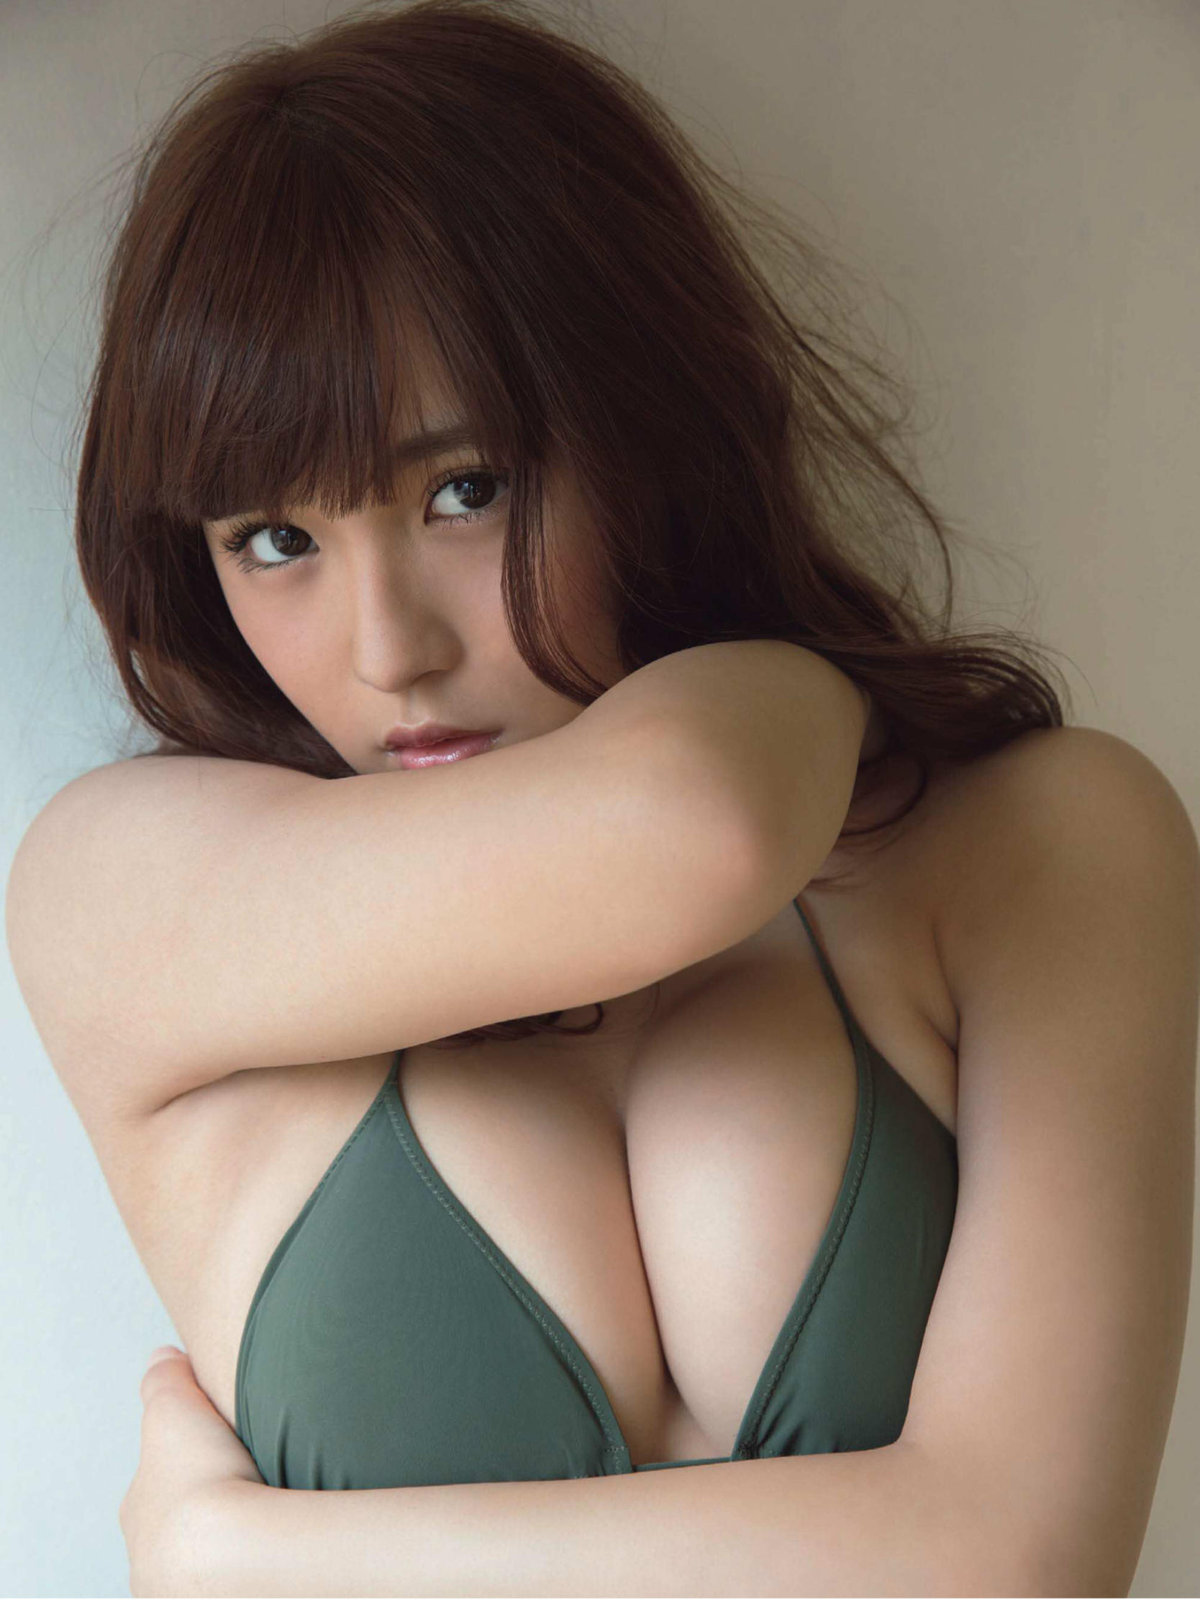 image http://scanlover.com/assets/images/414-KXWnb4dfkwxsaR38.jpeg